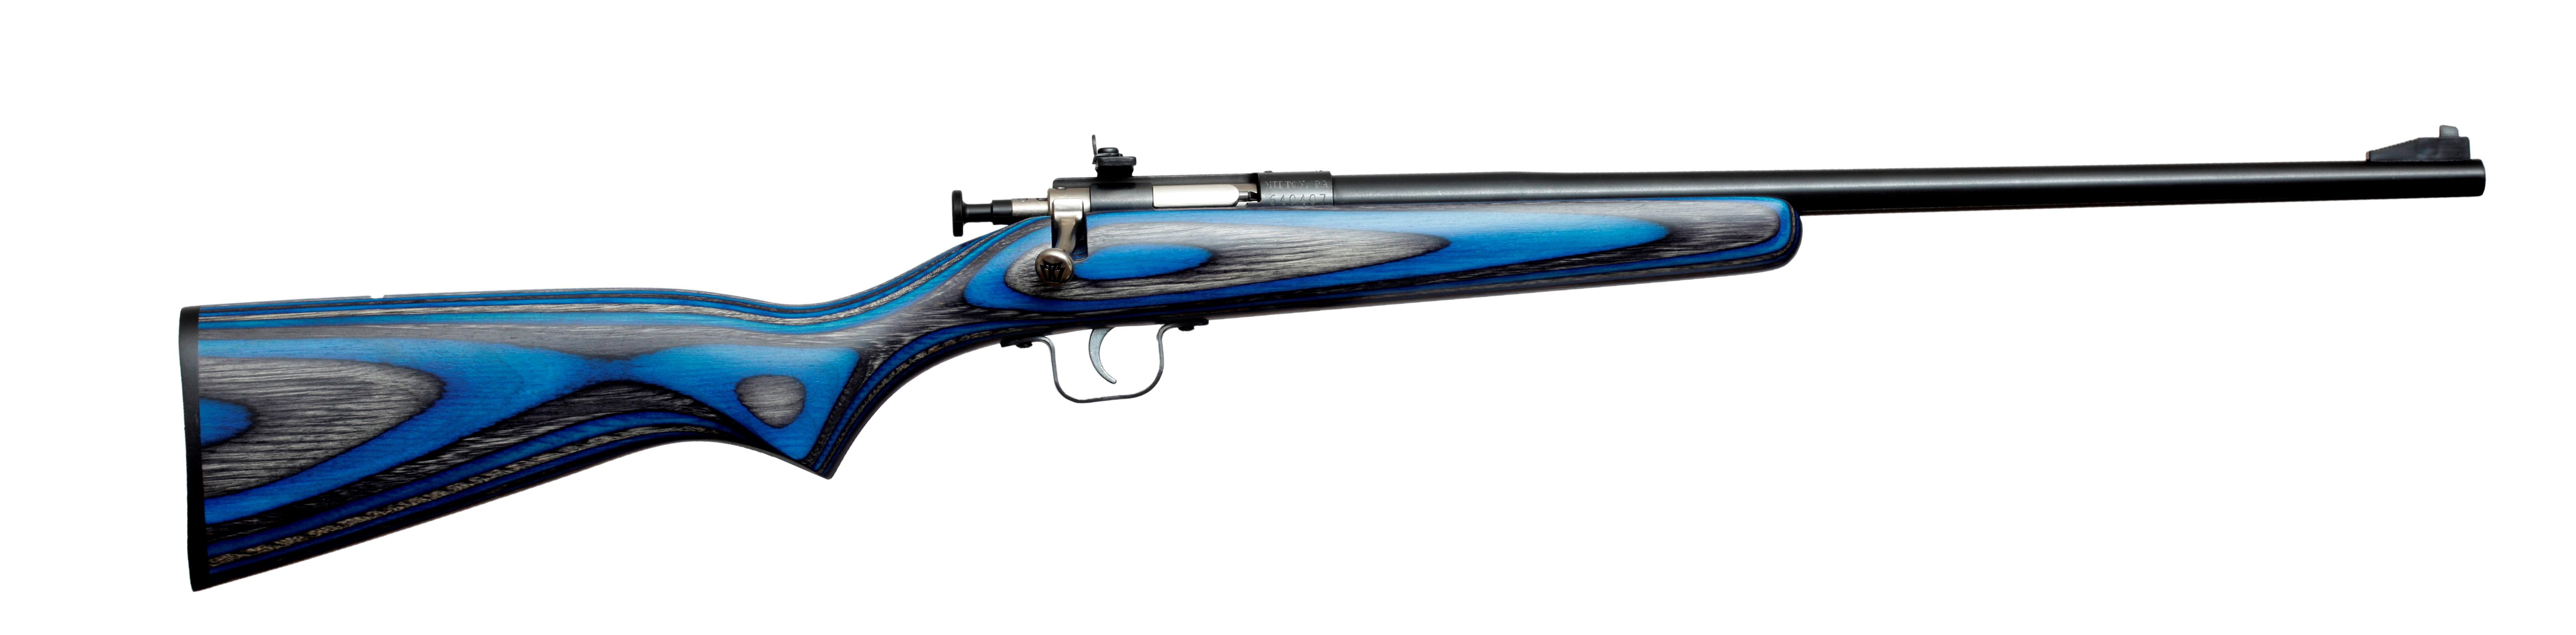 Keystone Sporting Arms Crickett 22 LR